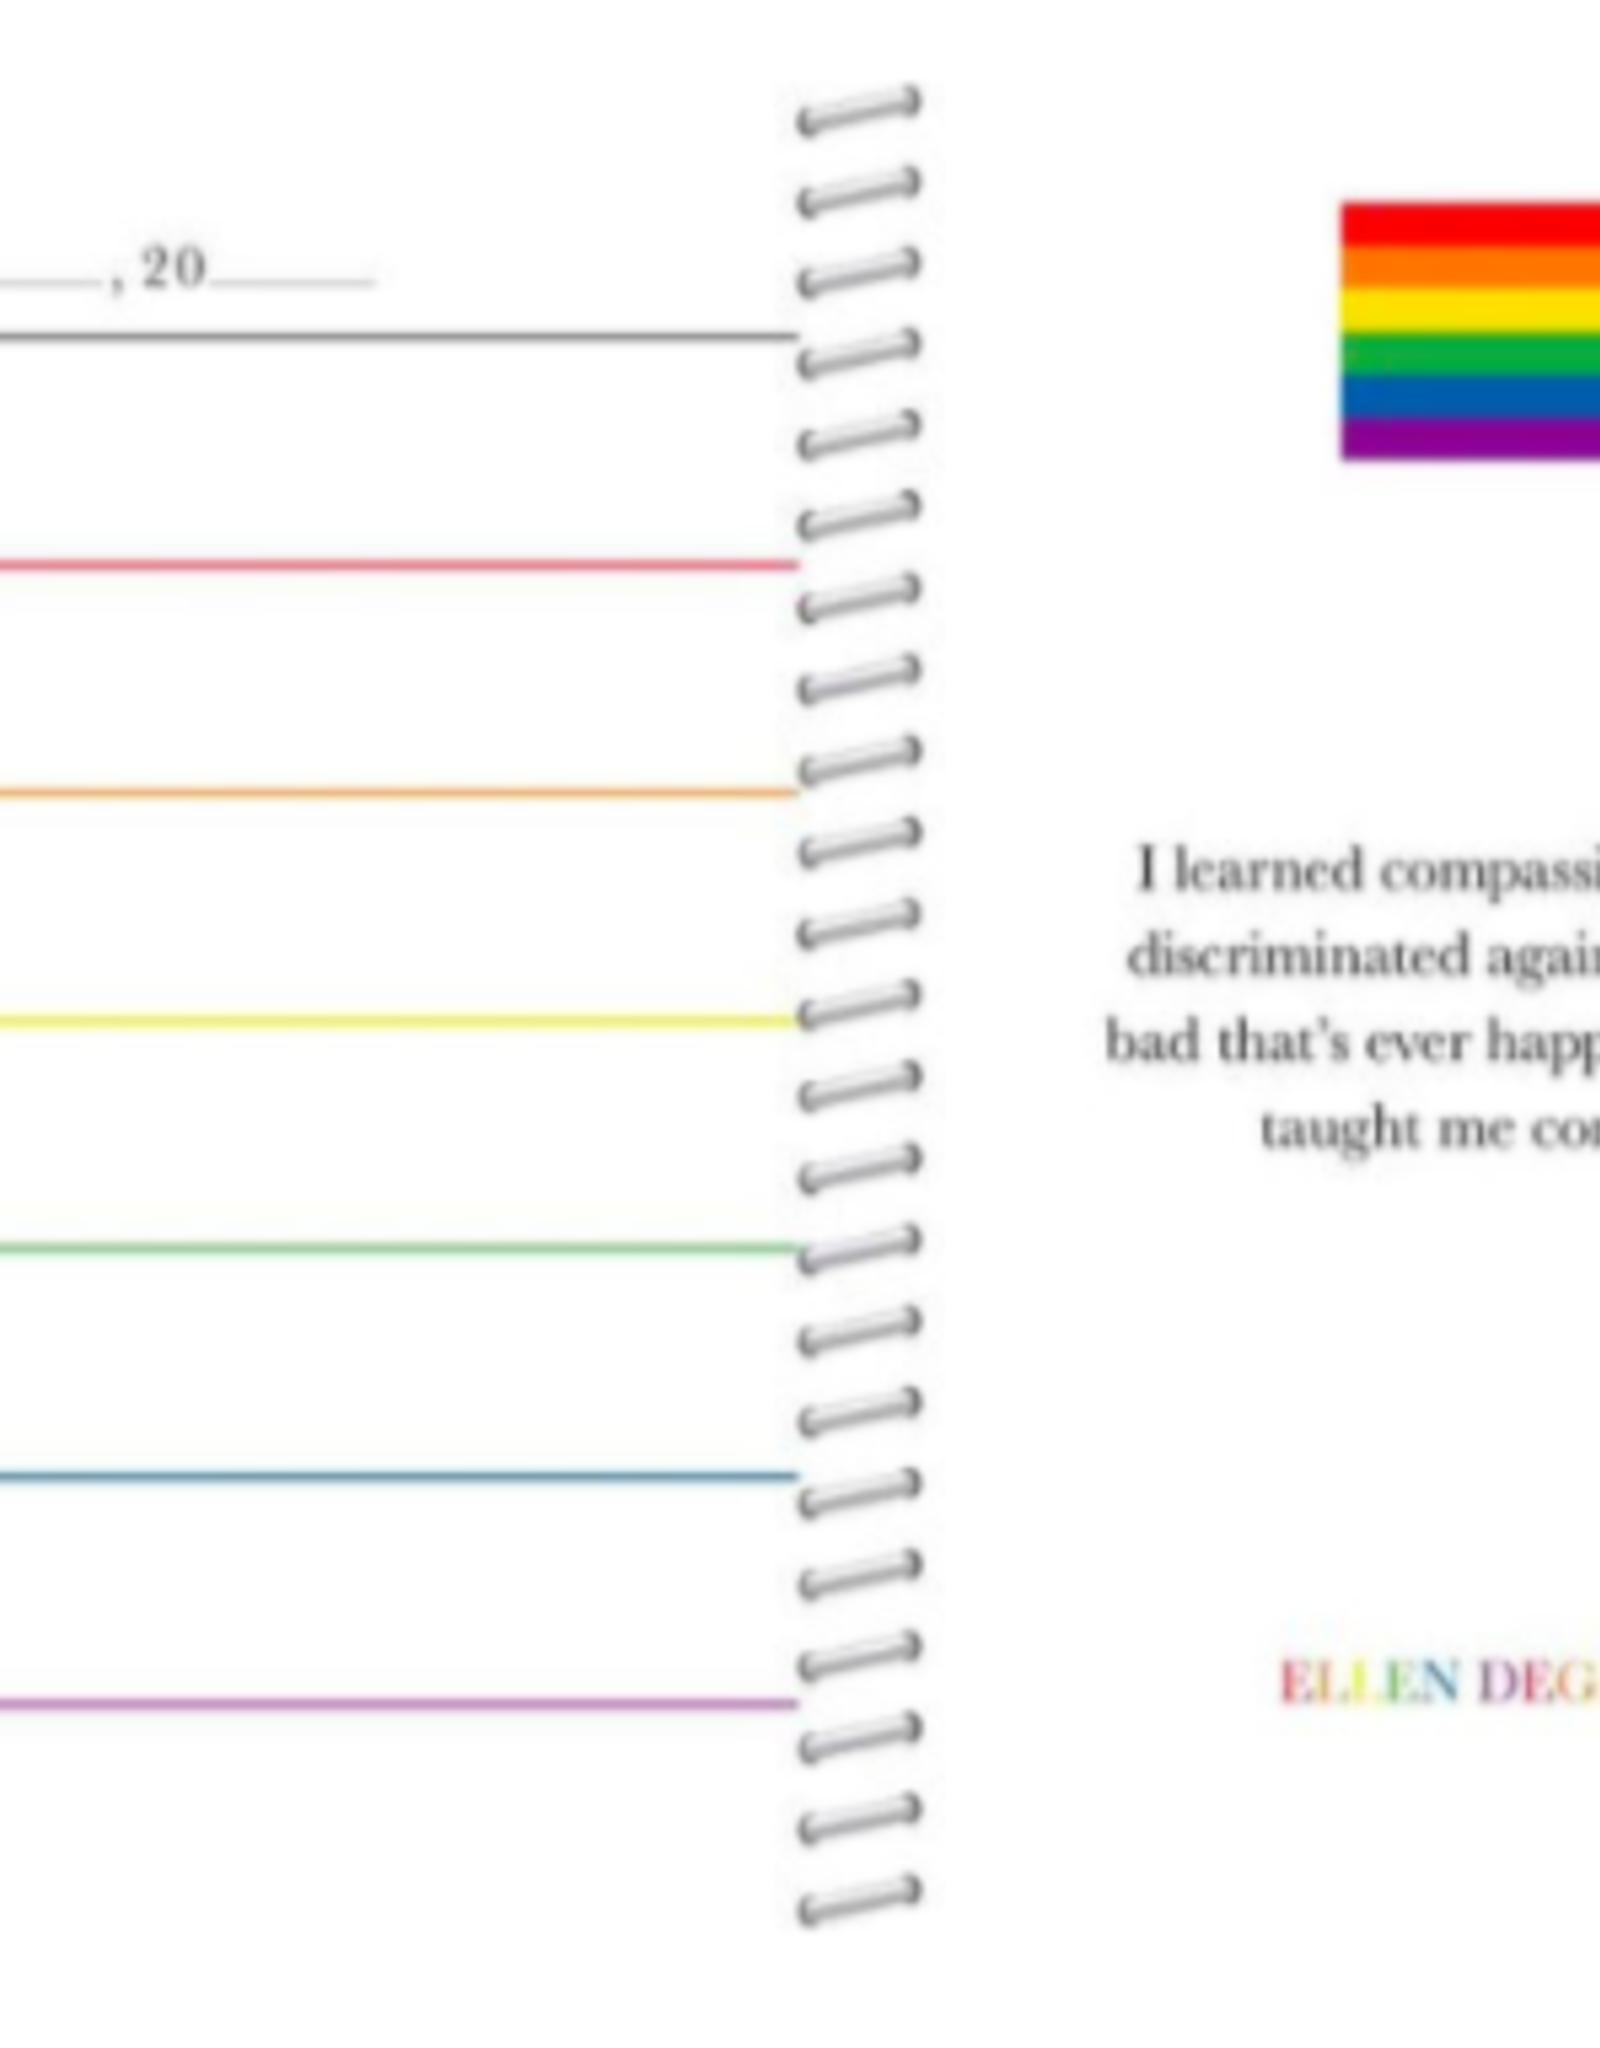 The Gay Undated Agenda